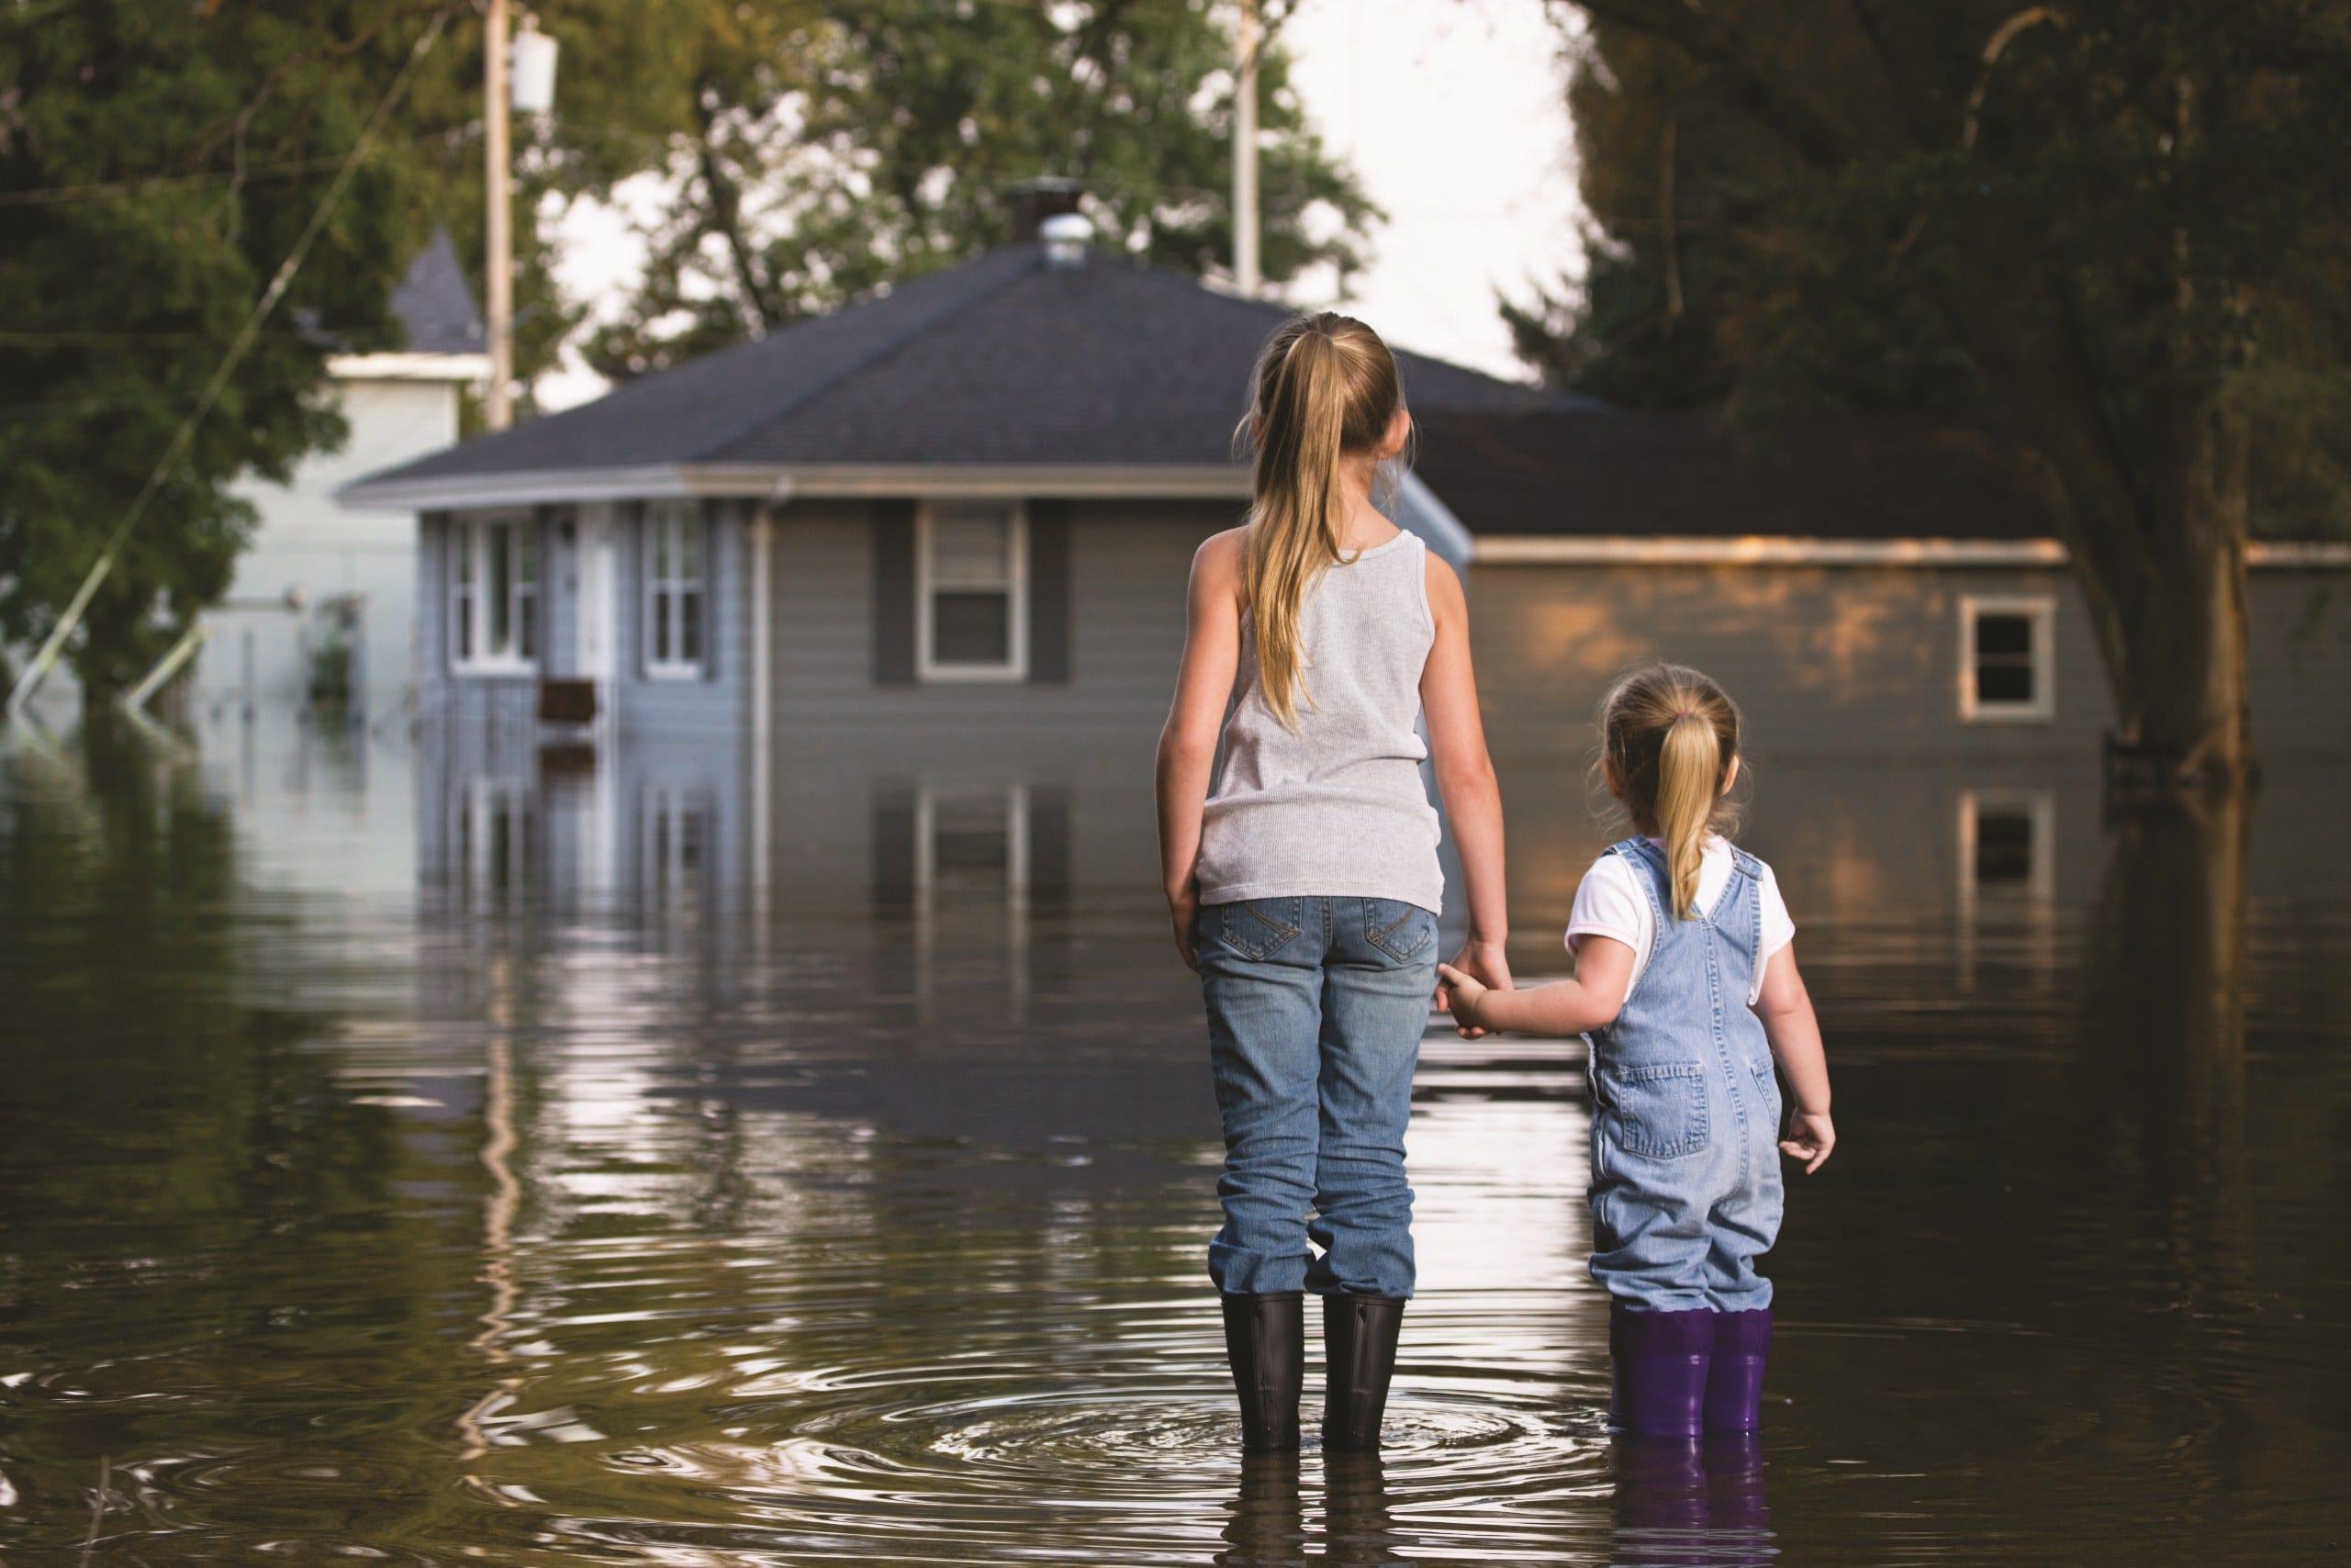 ottawa flood damage repair